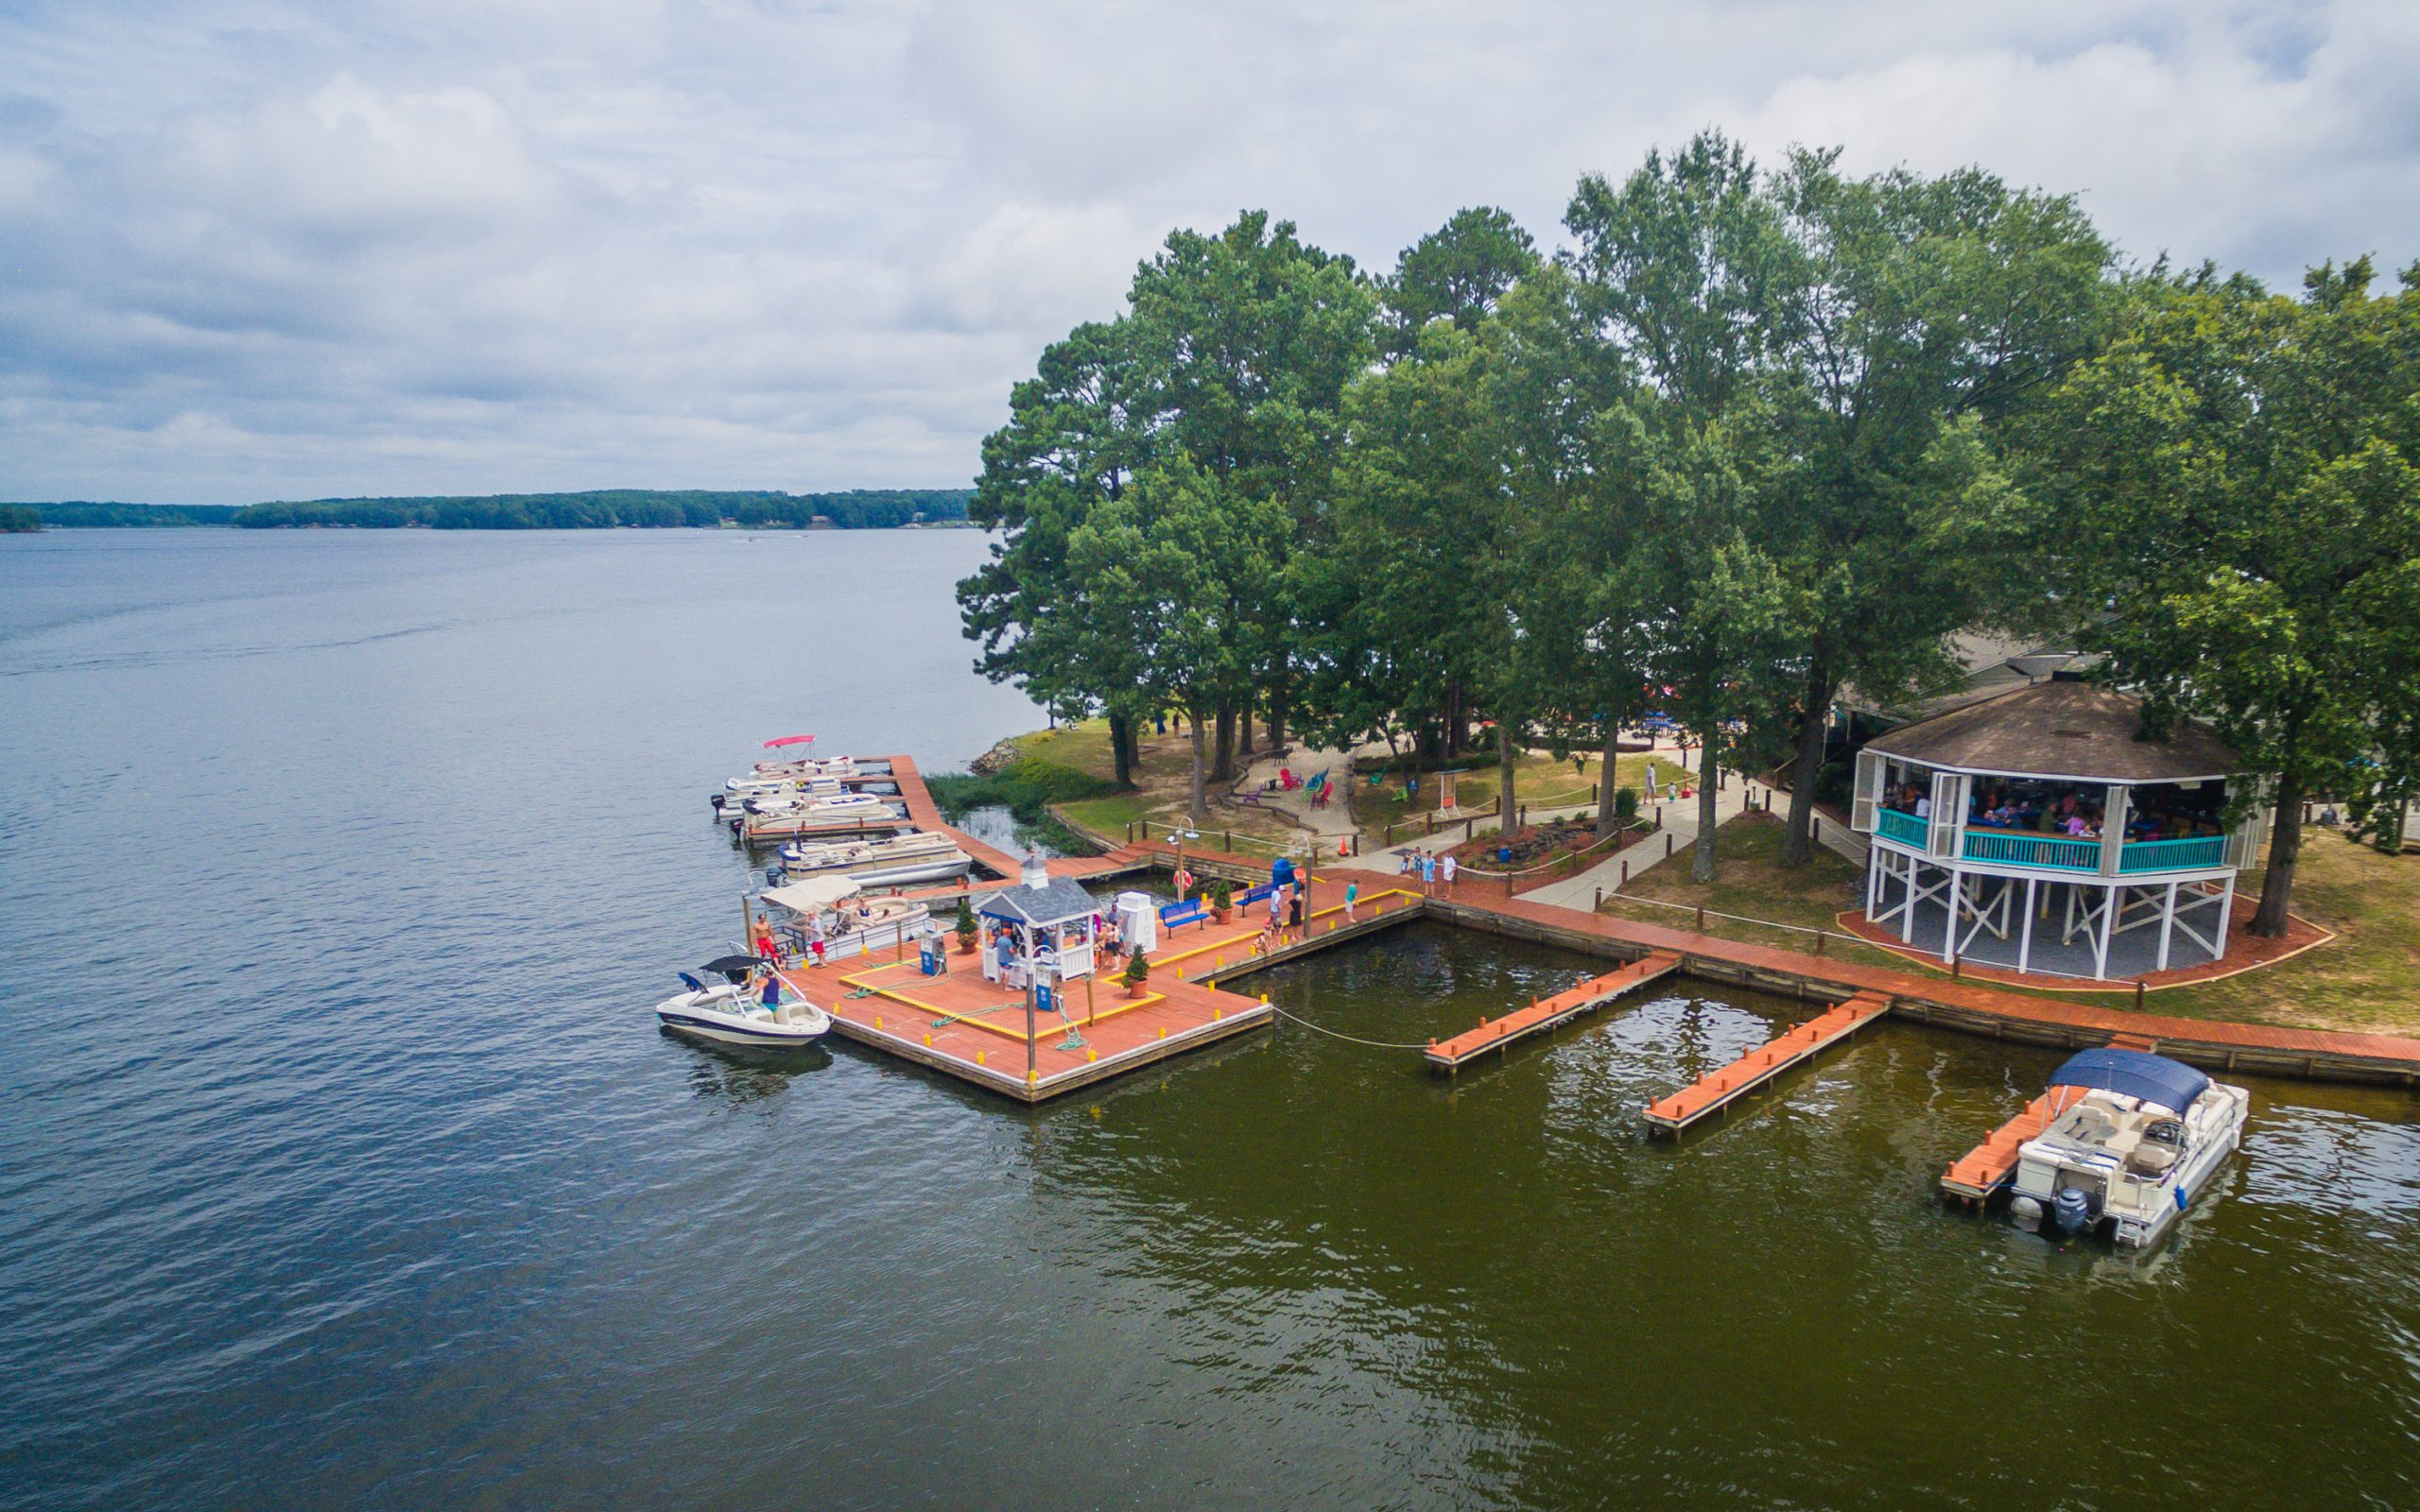 Eaton Ferry Marina boat docks on lake Gaston